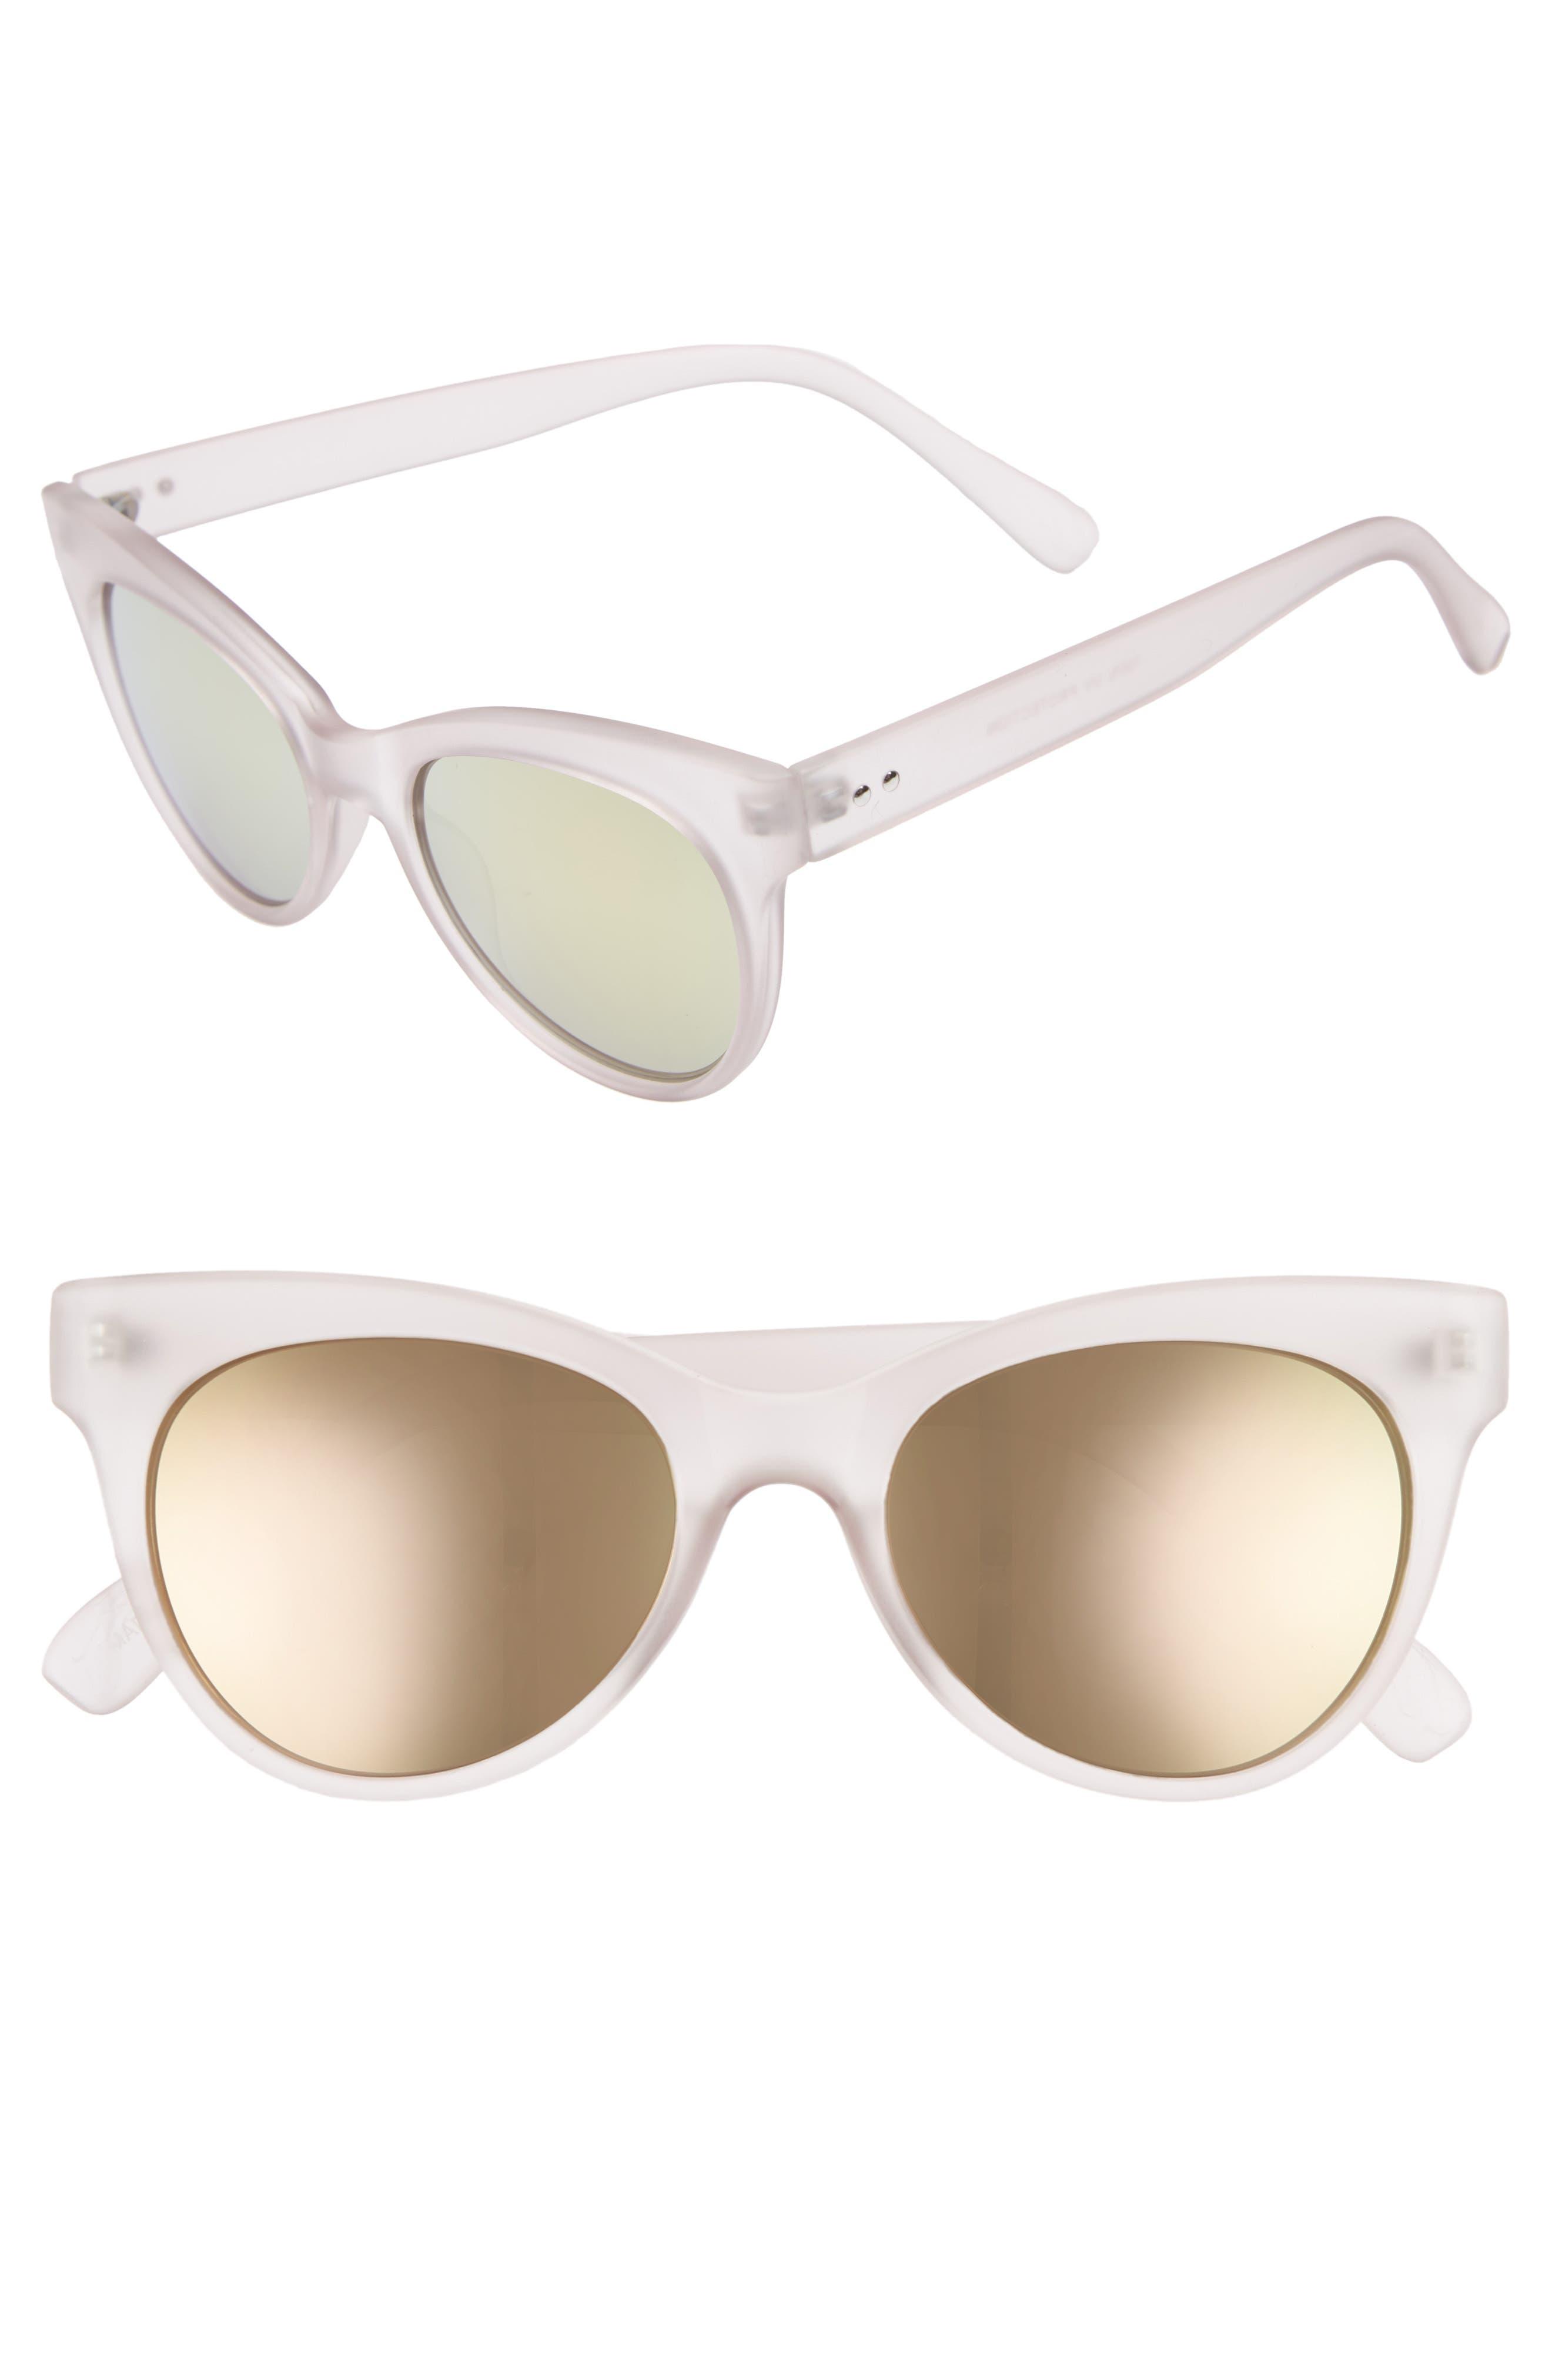 56mm Cat Eye Sunglasses,                             Main thumbnail 1, color,                             Milky Pink/ Pink